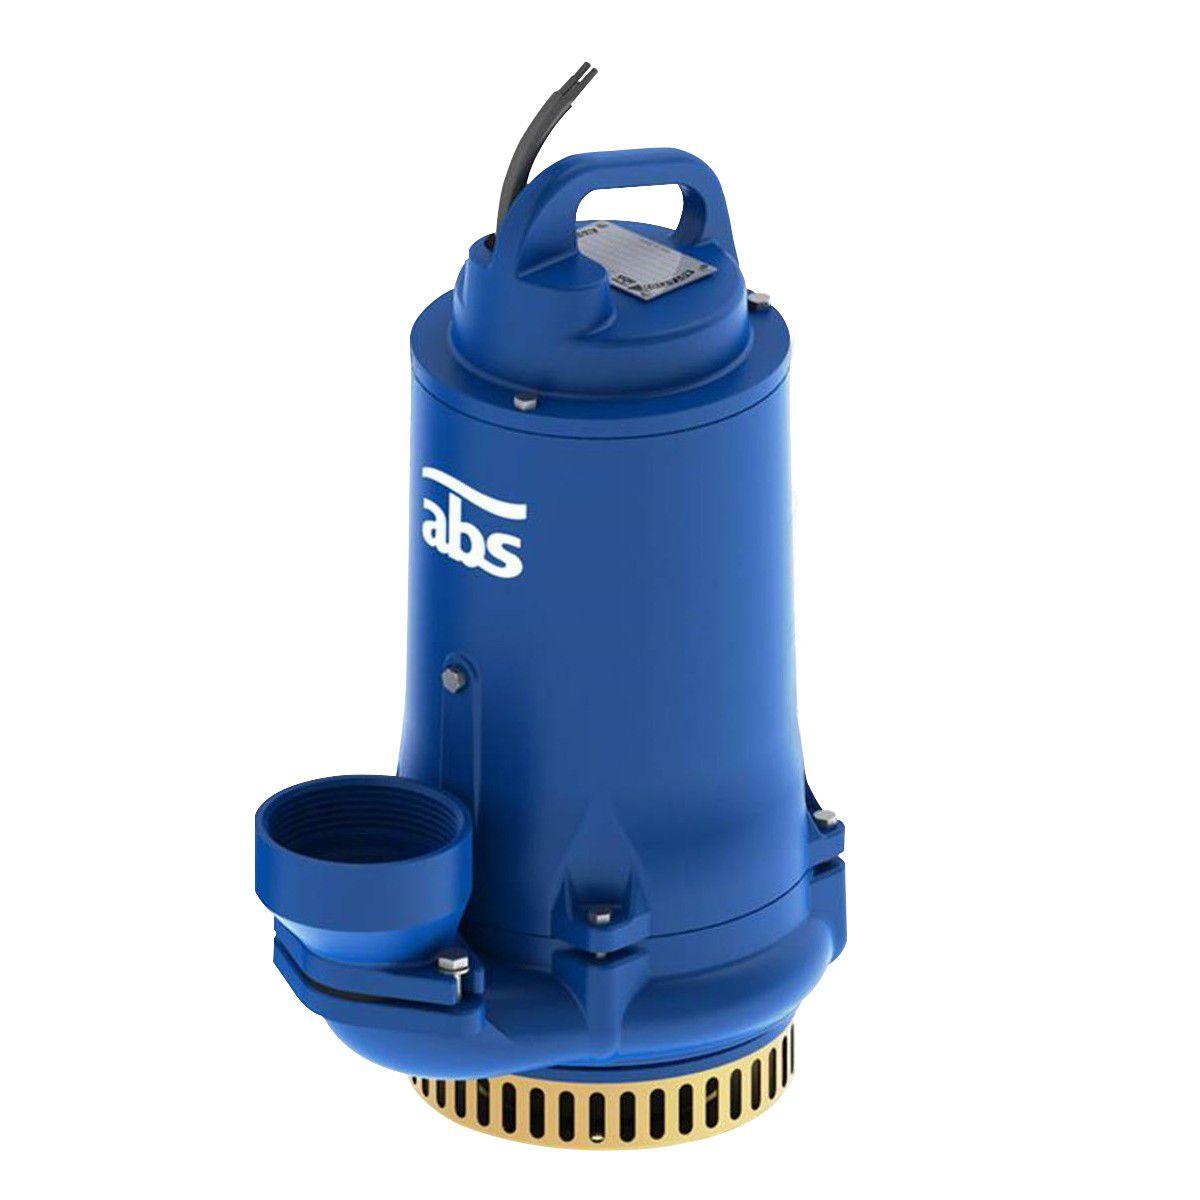 Bomba ABS Sulzer Submersa UNI 700 T Standard 2,0CV - 220V